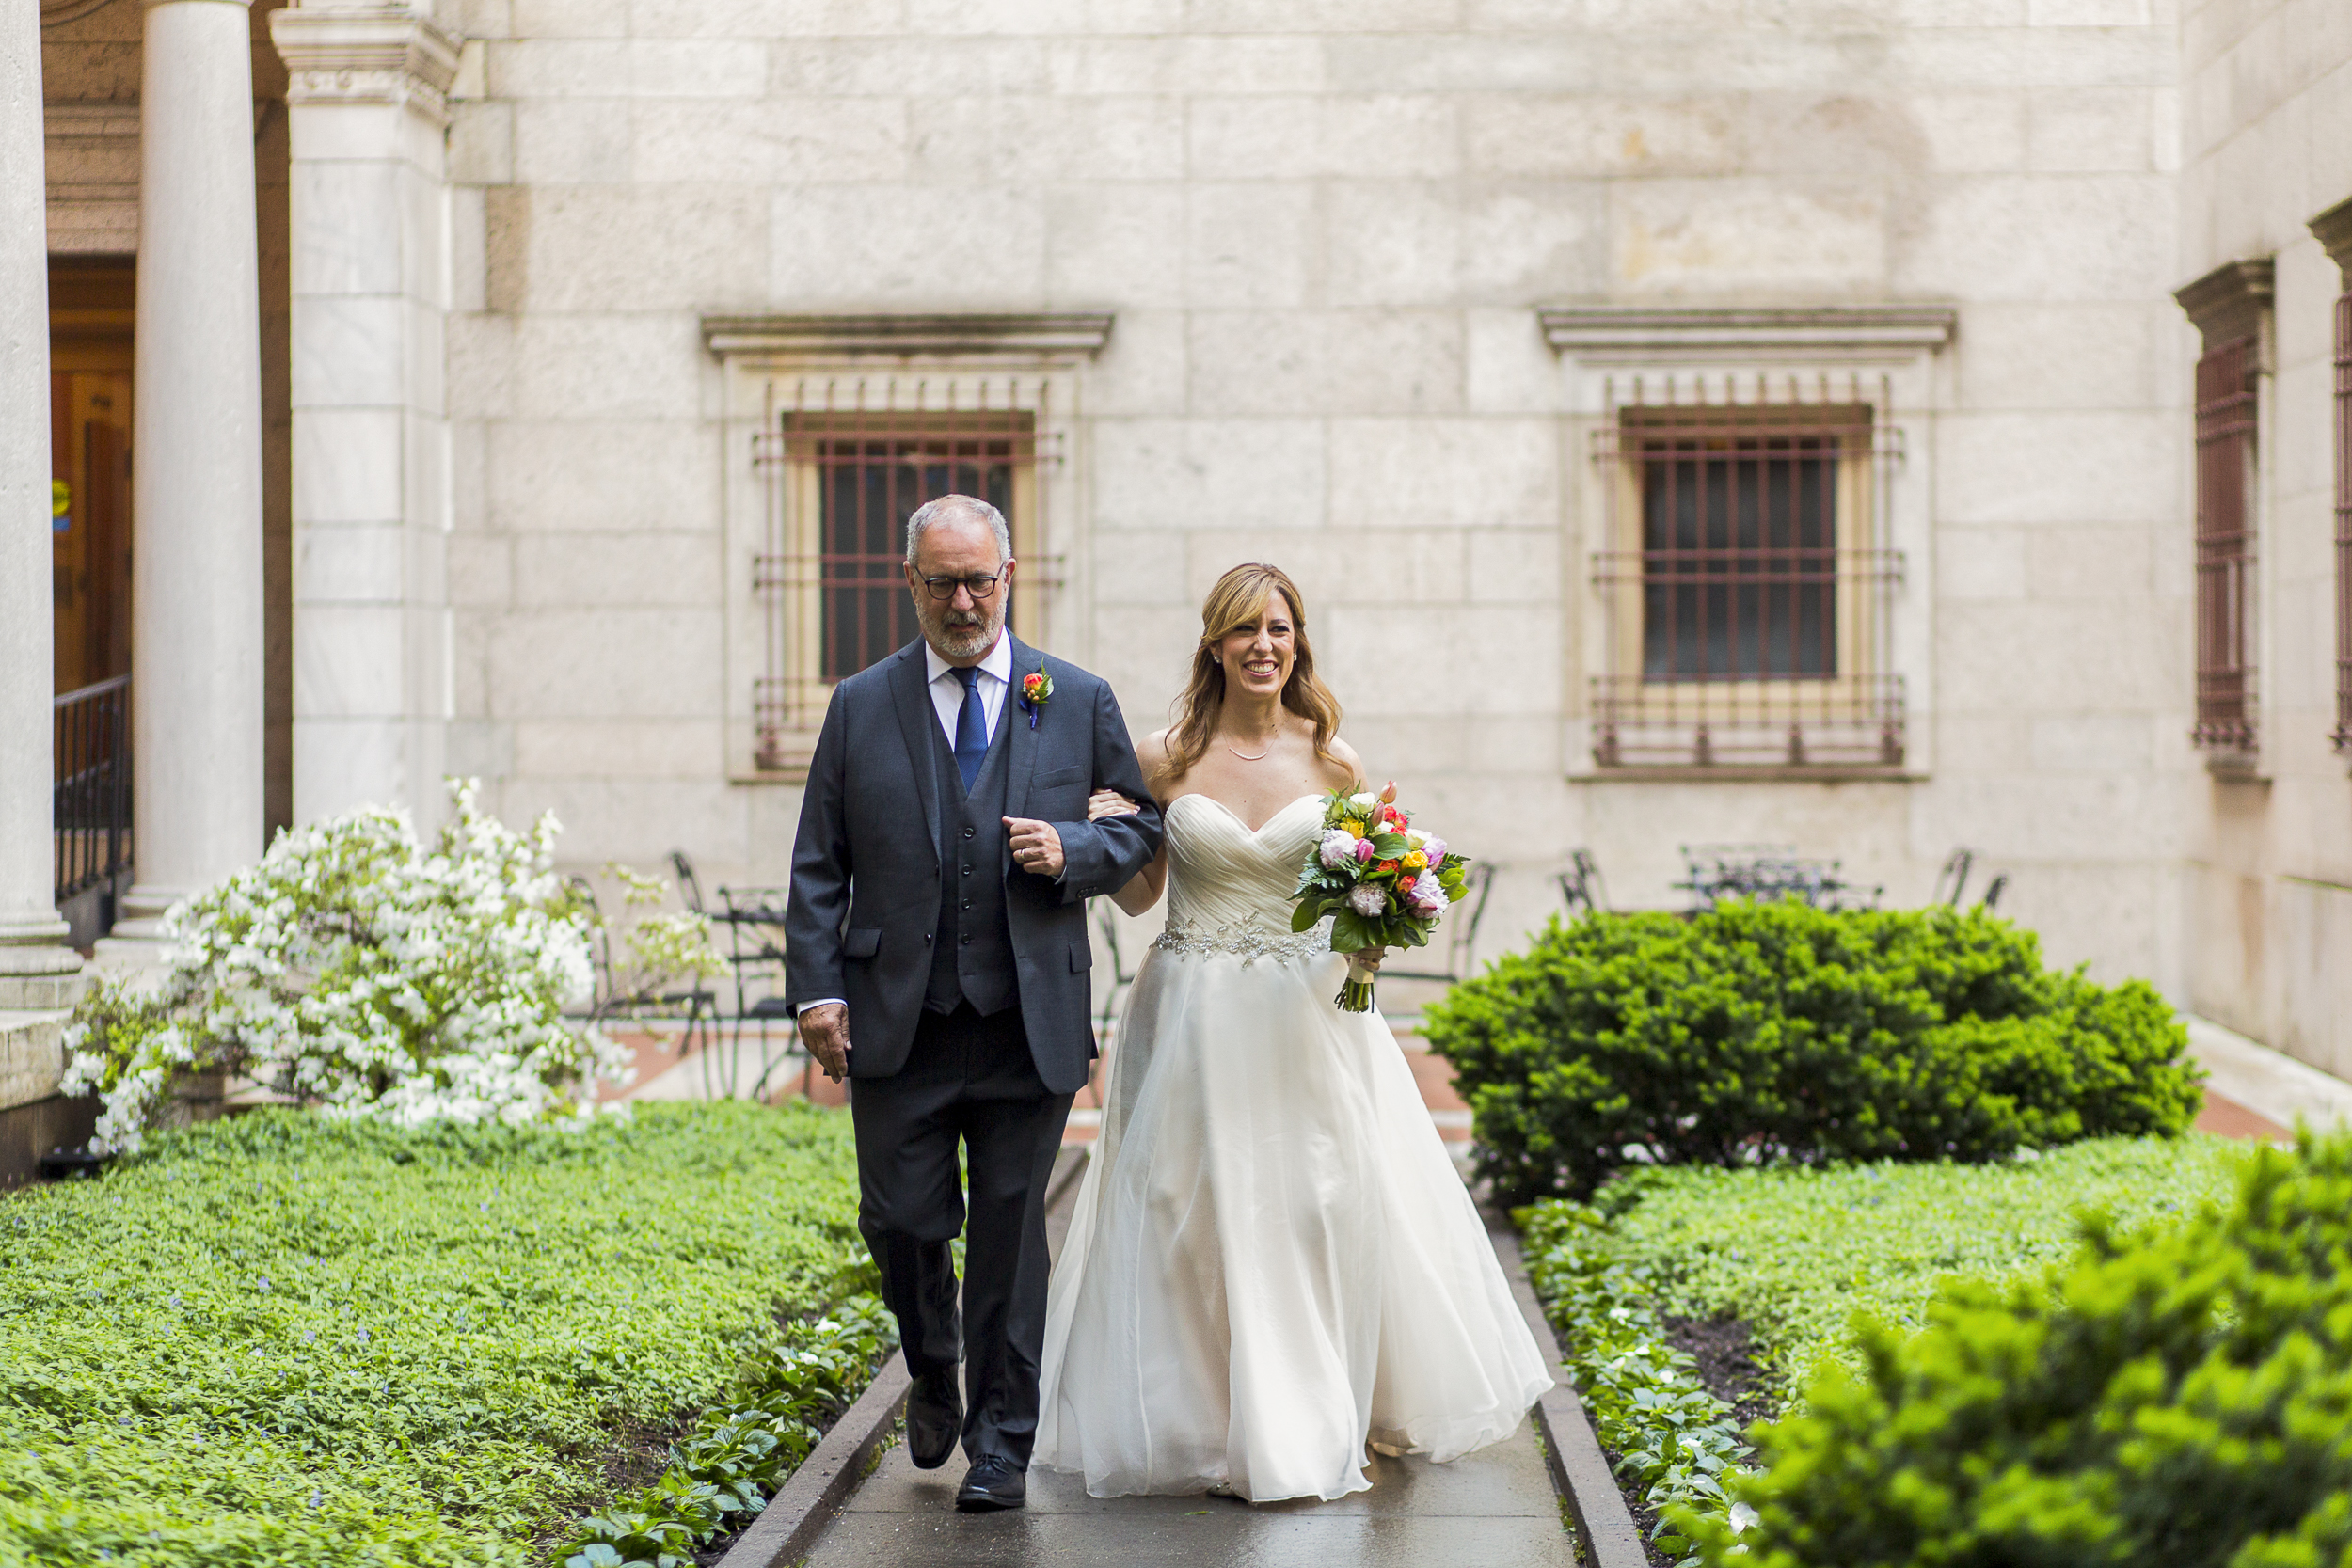 Boston Public Library Wedding Ceremony